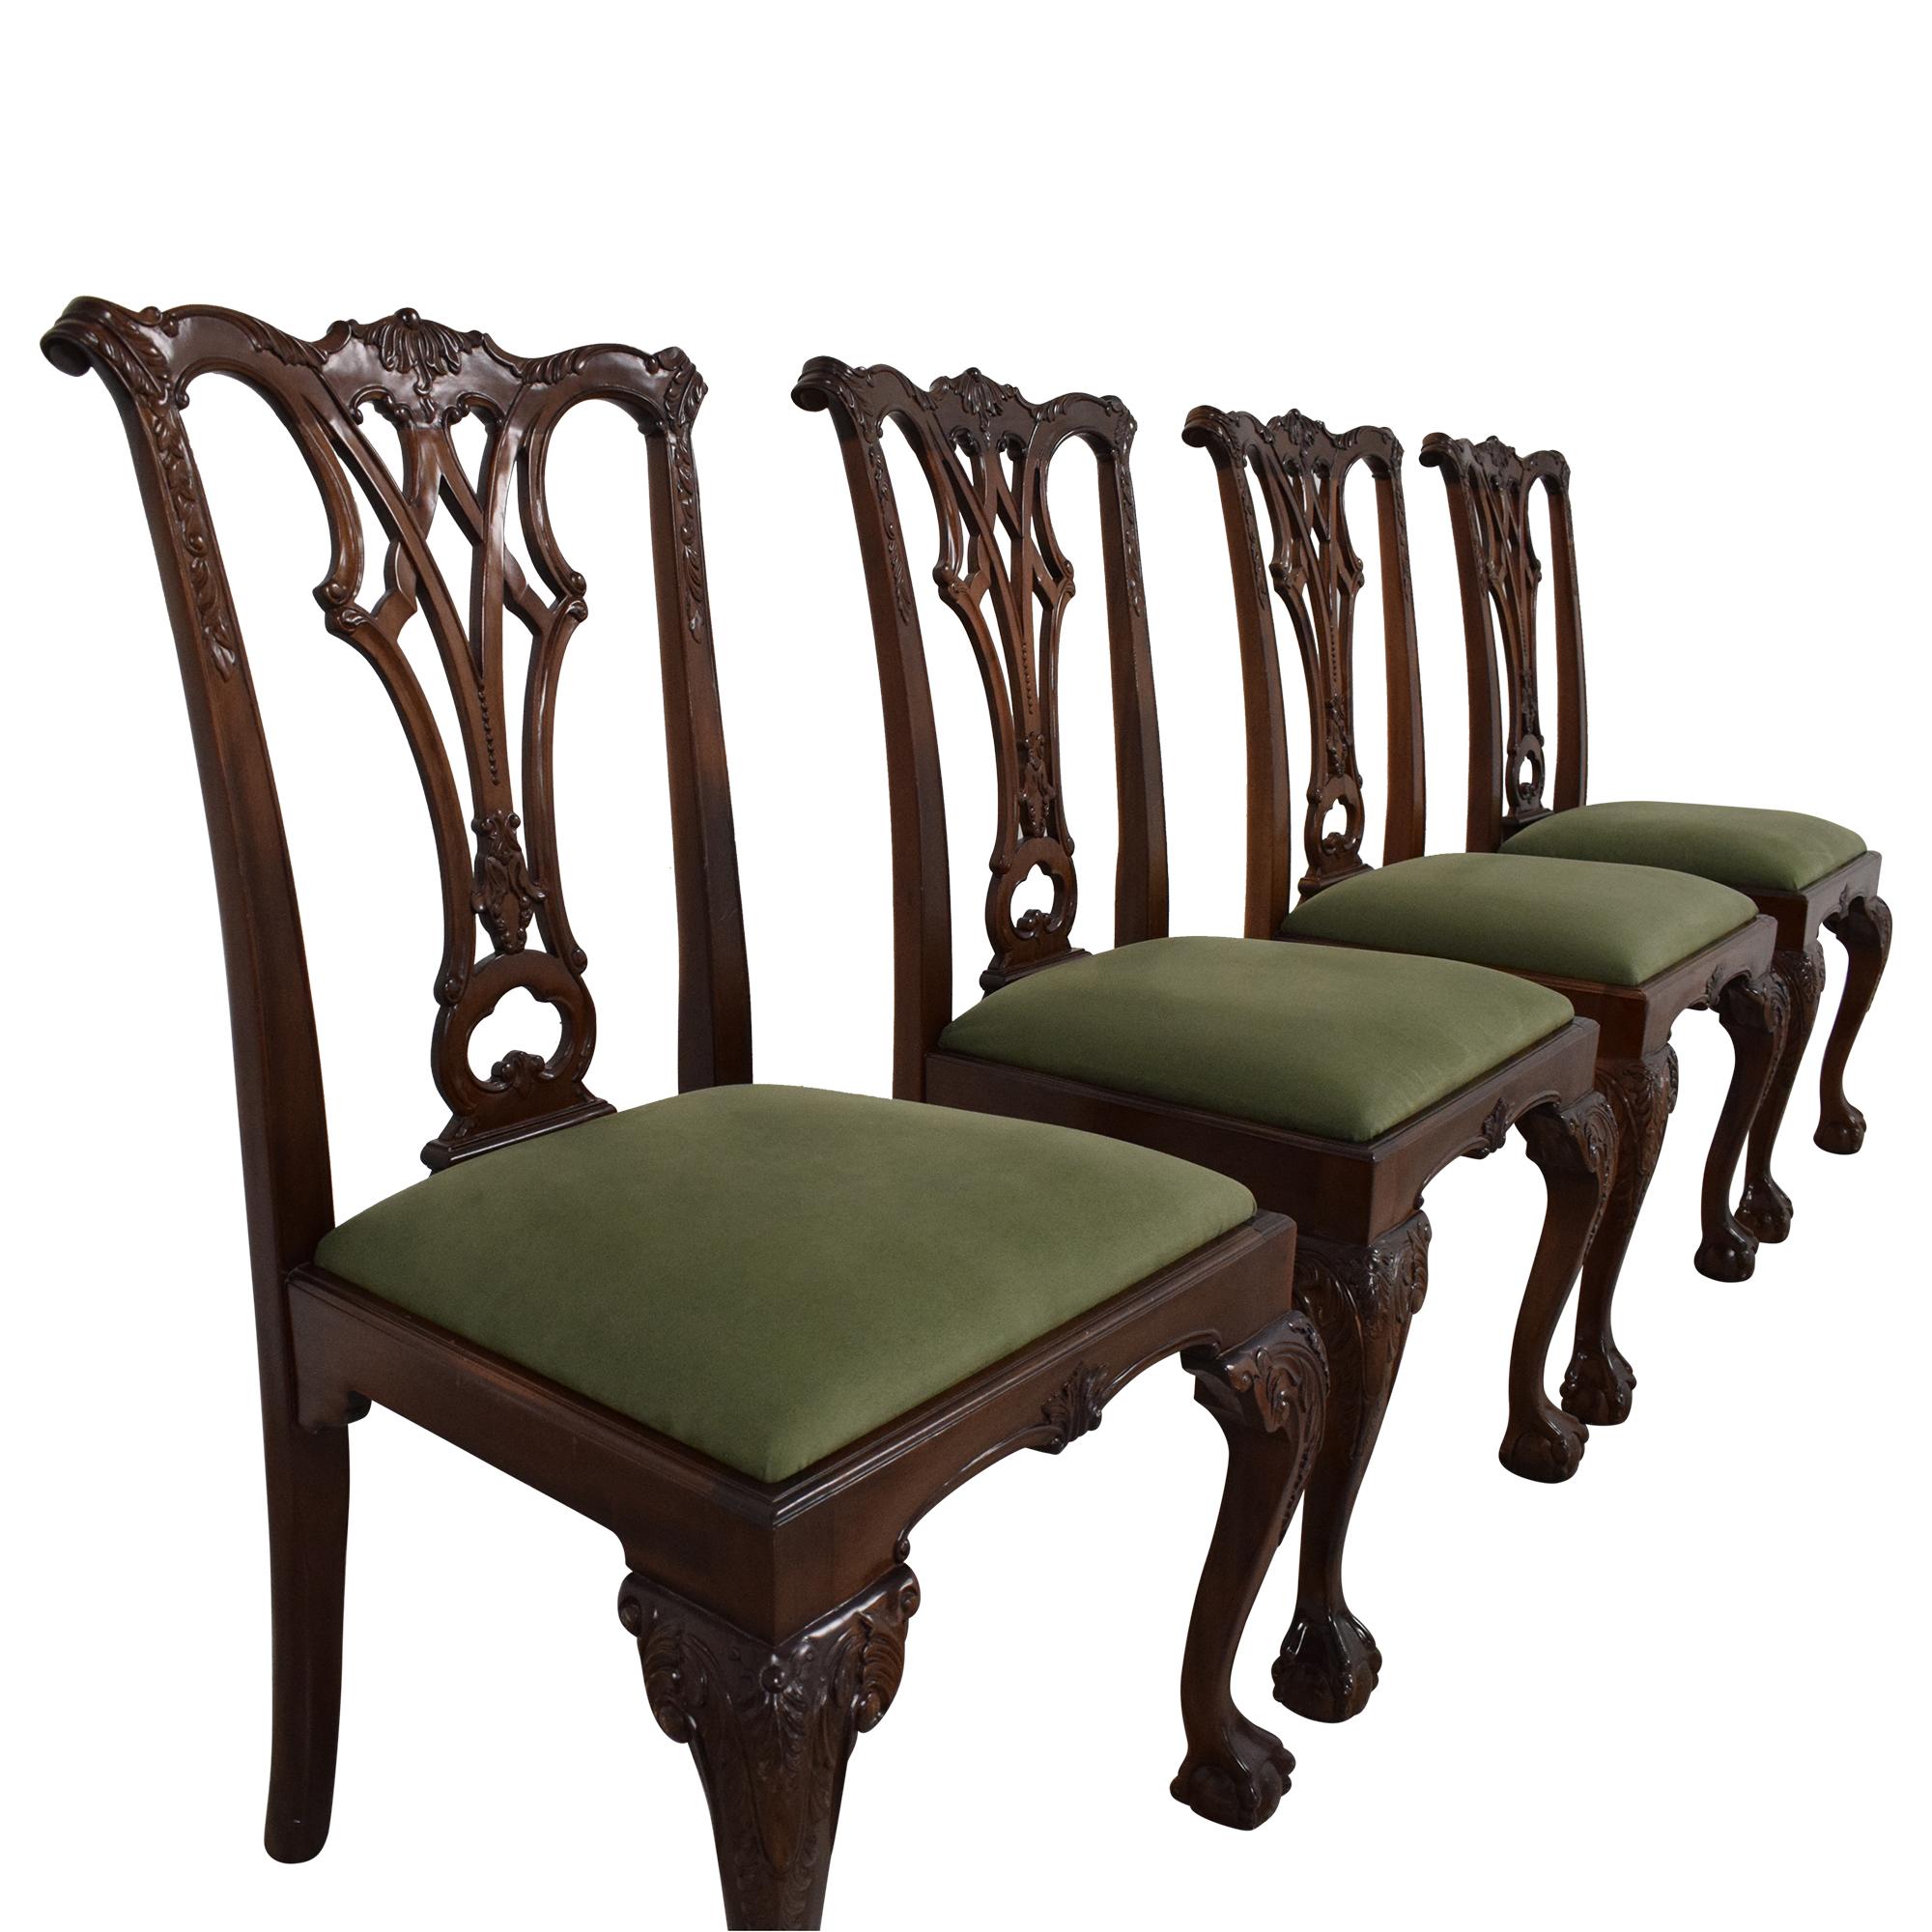 Greenbaum Interiors Greenbaum Interiors Vintage Upholstered Dining Chairs dimensions